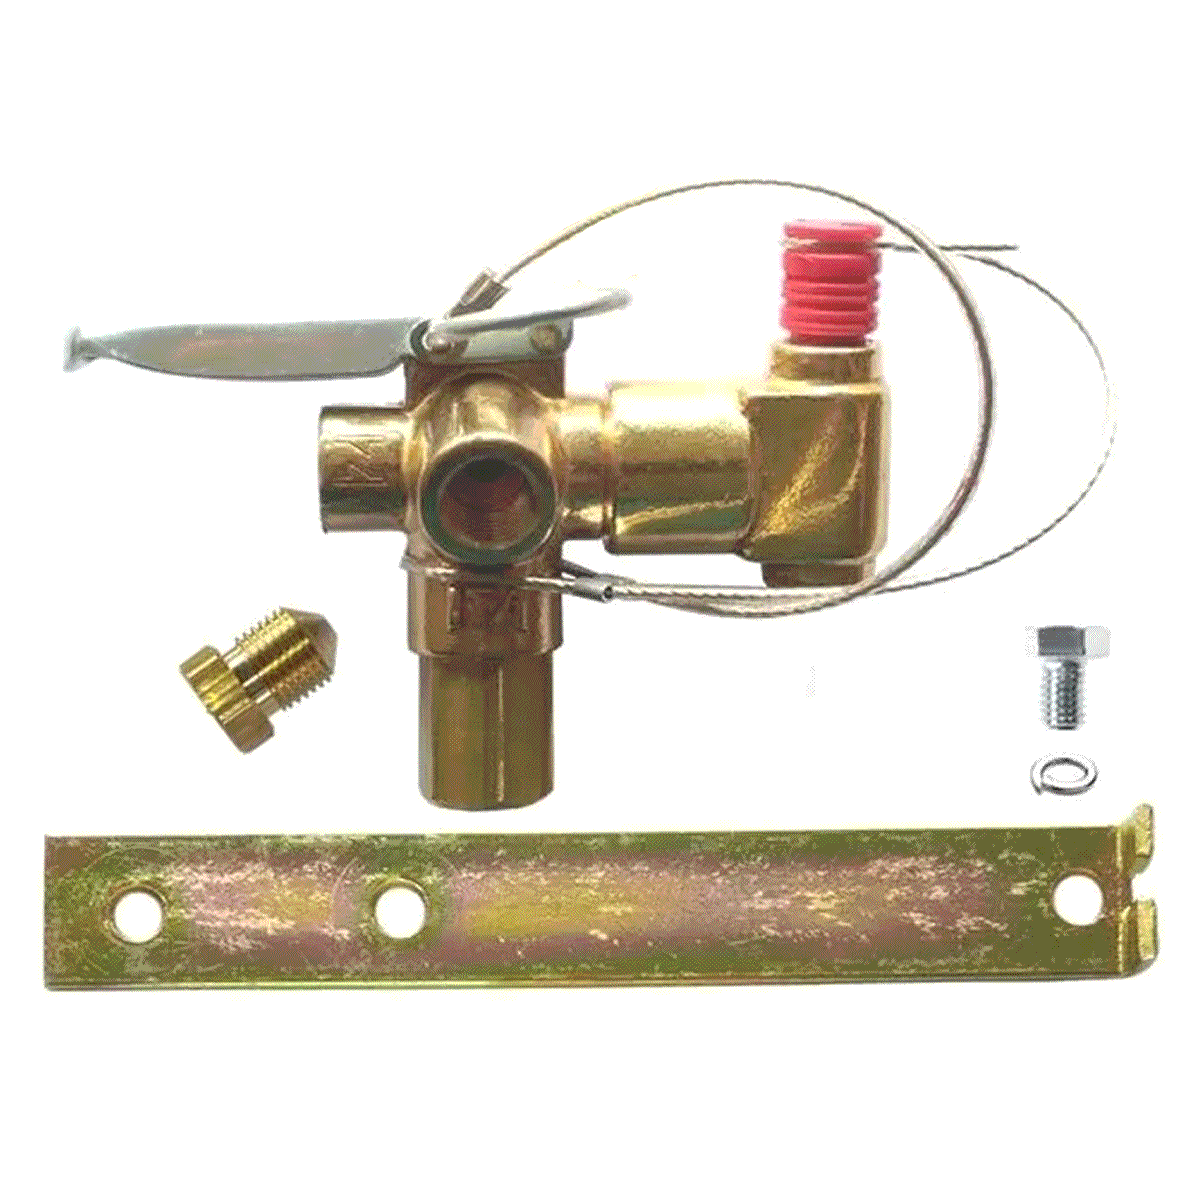 Kit 3 Válvulas GNV ITA Abastecimento Interno Caput